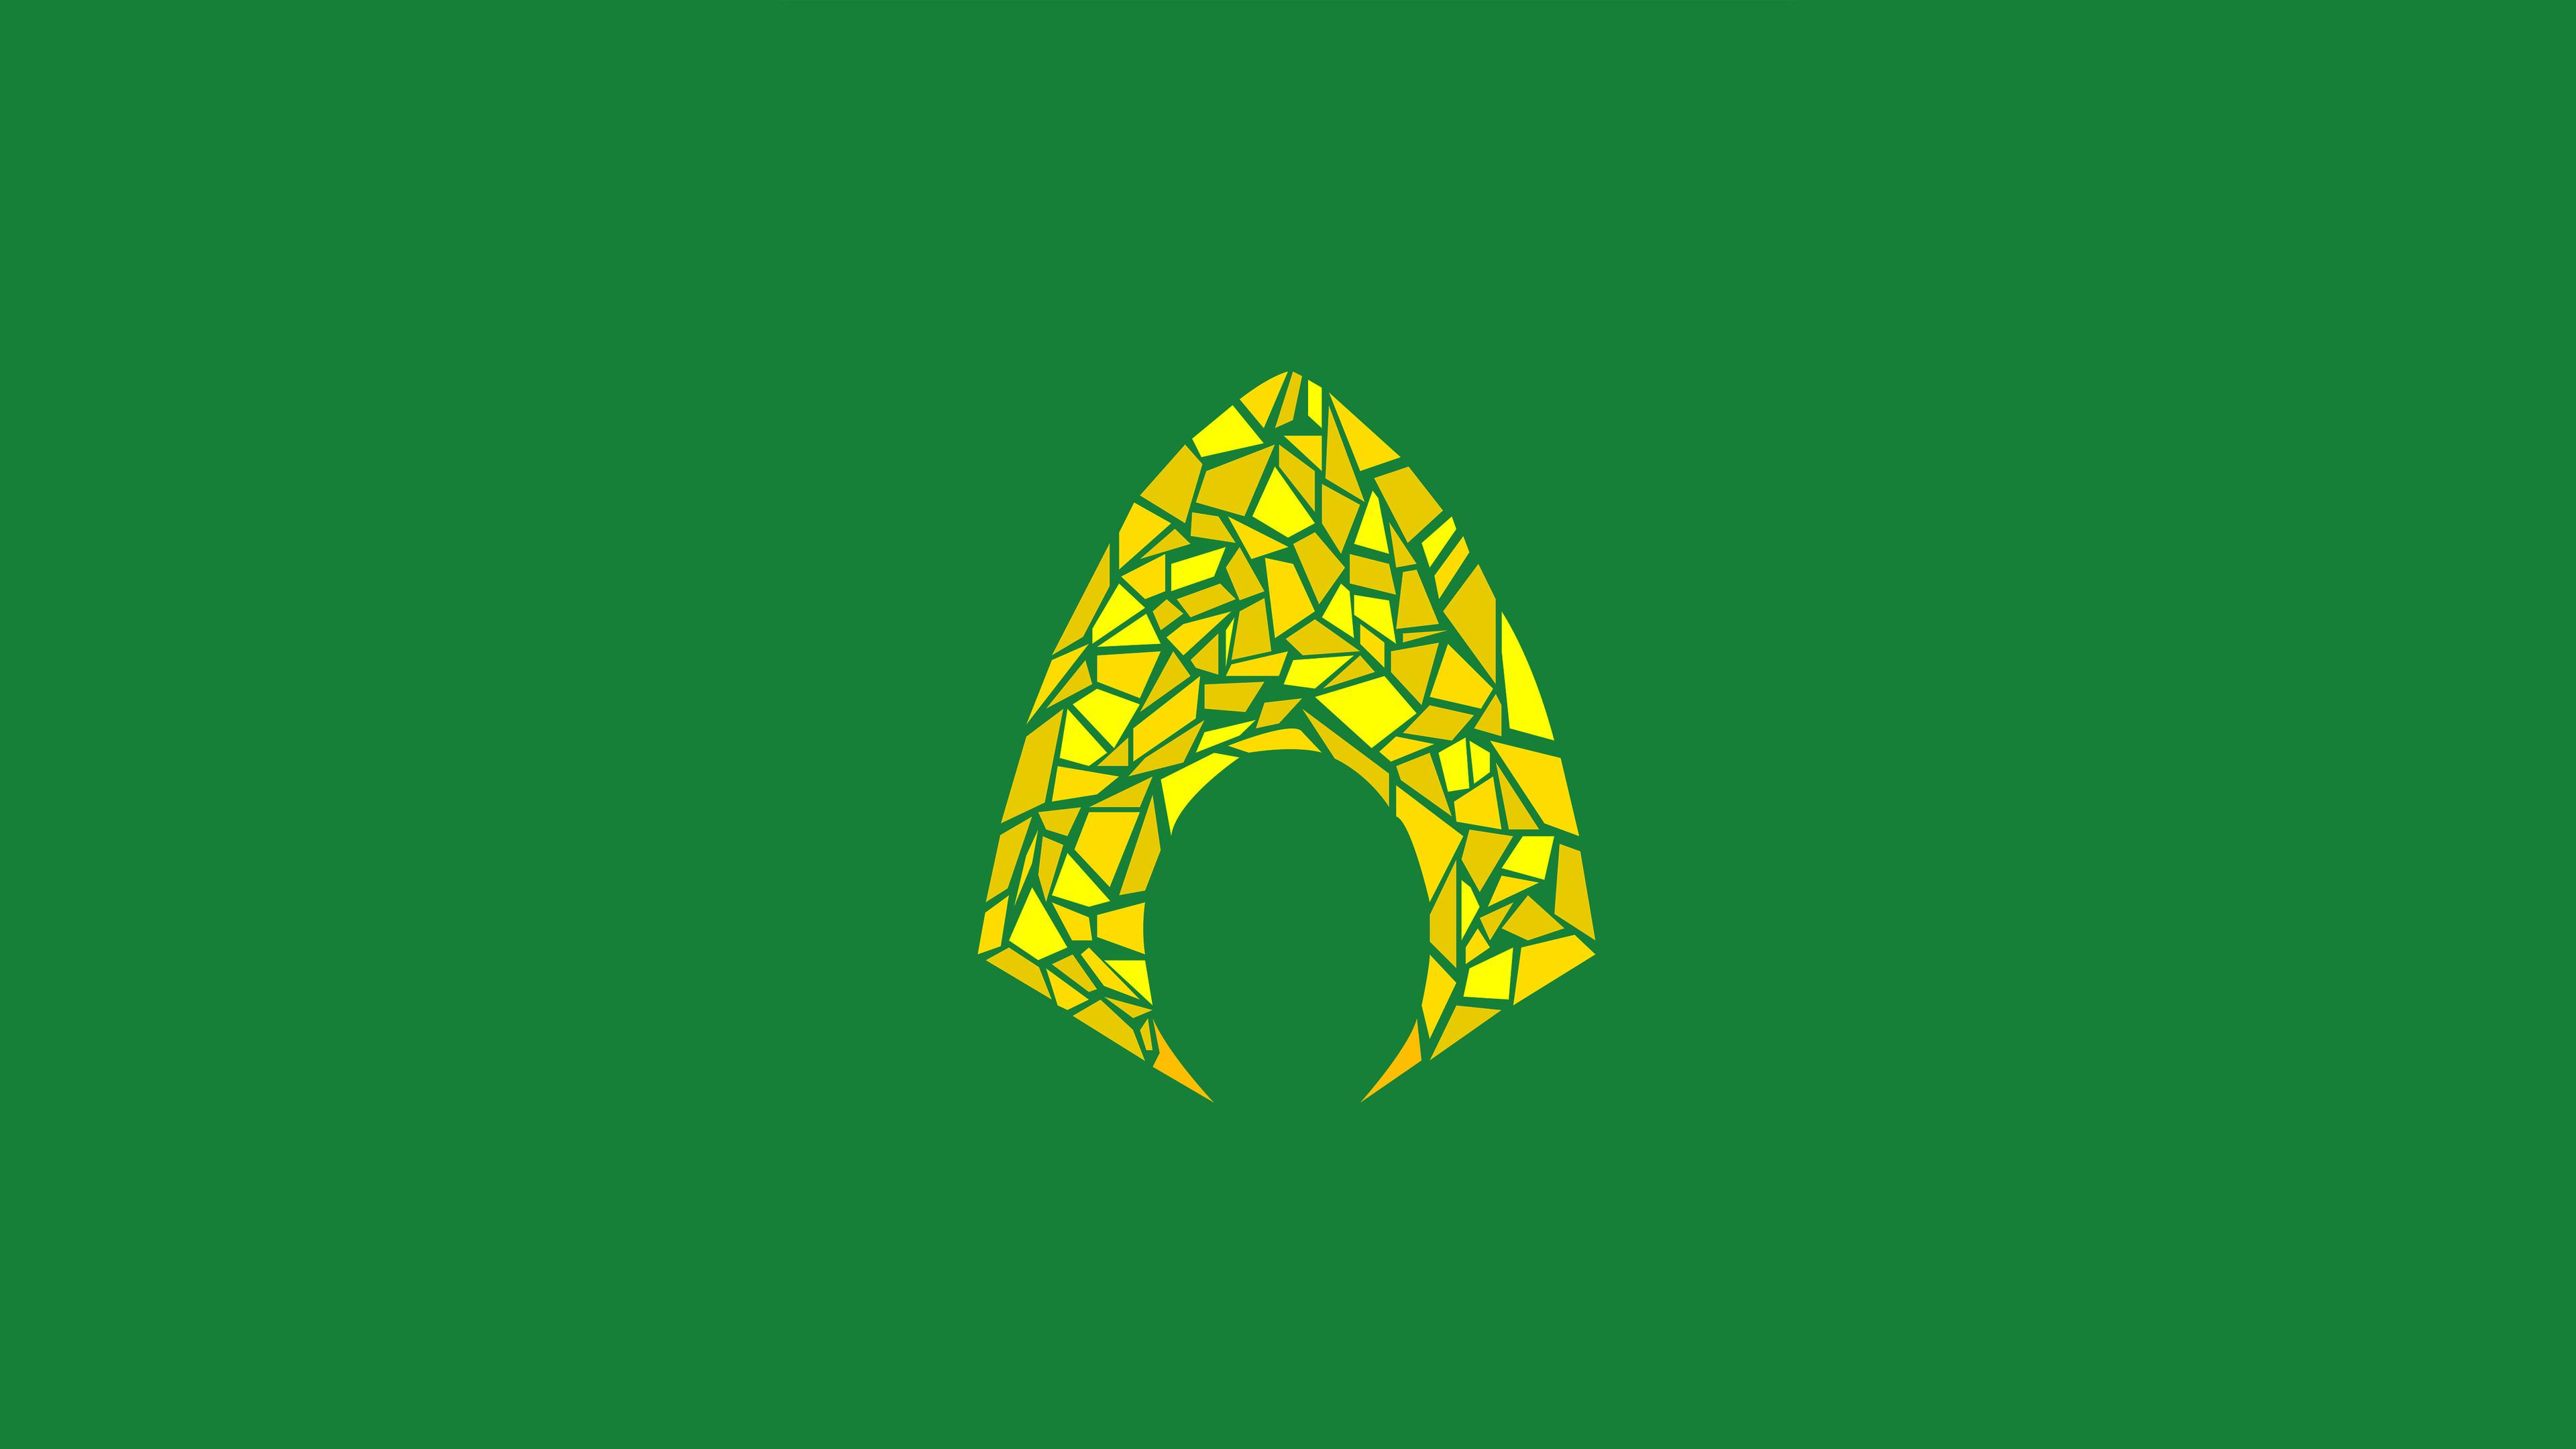 aquaman logo artwork 1536522070 - Aquaman Logo Artwork - logo wallpapers, hd-wallpapers, digital art wallpapers, deviantart wallpapers, artwork wallpapers, artist wallpapers, aquaman wallpapers, 5k wallpapers, 4k-wallpapers